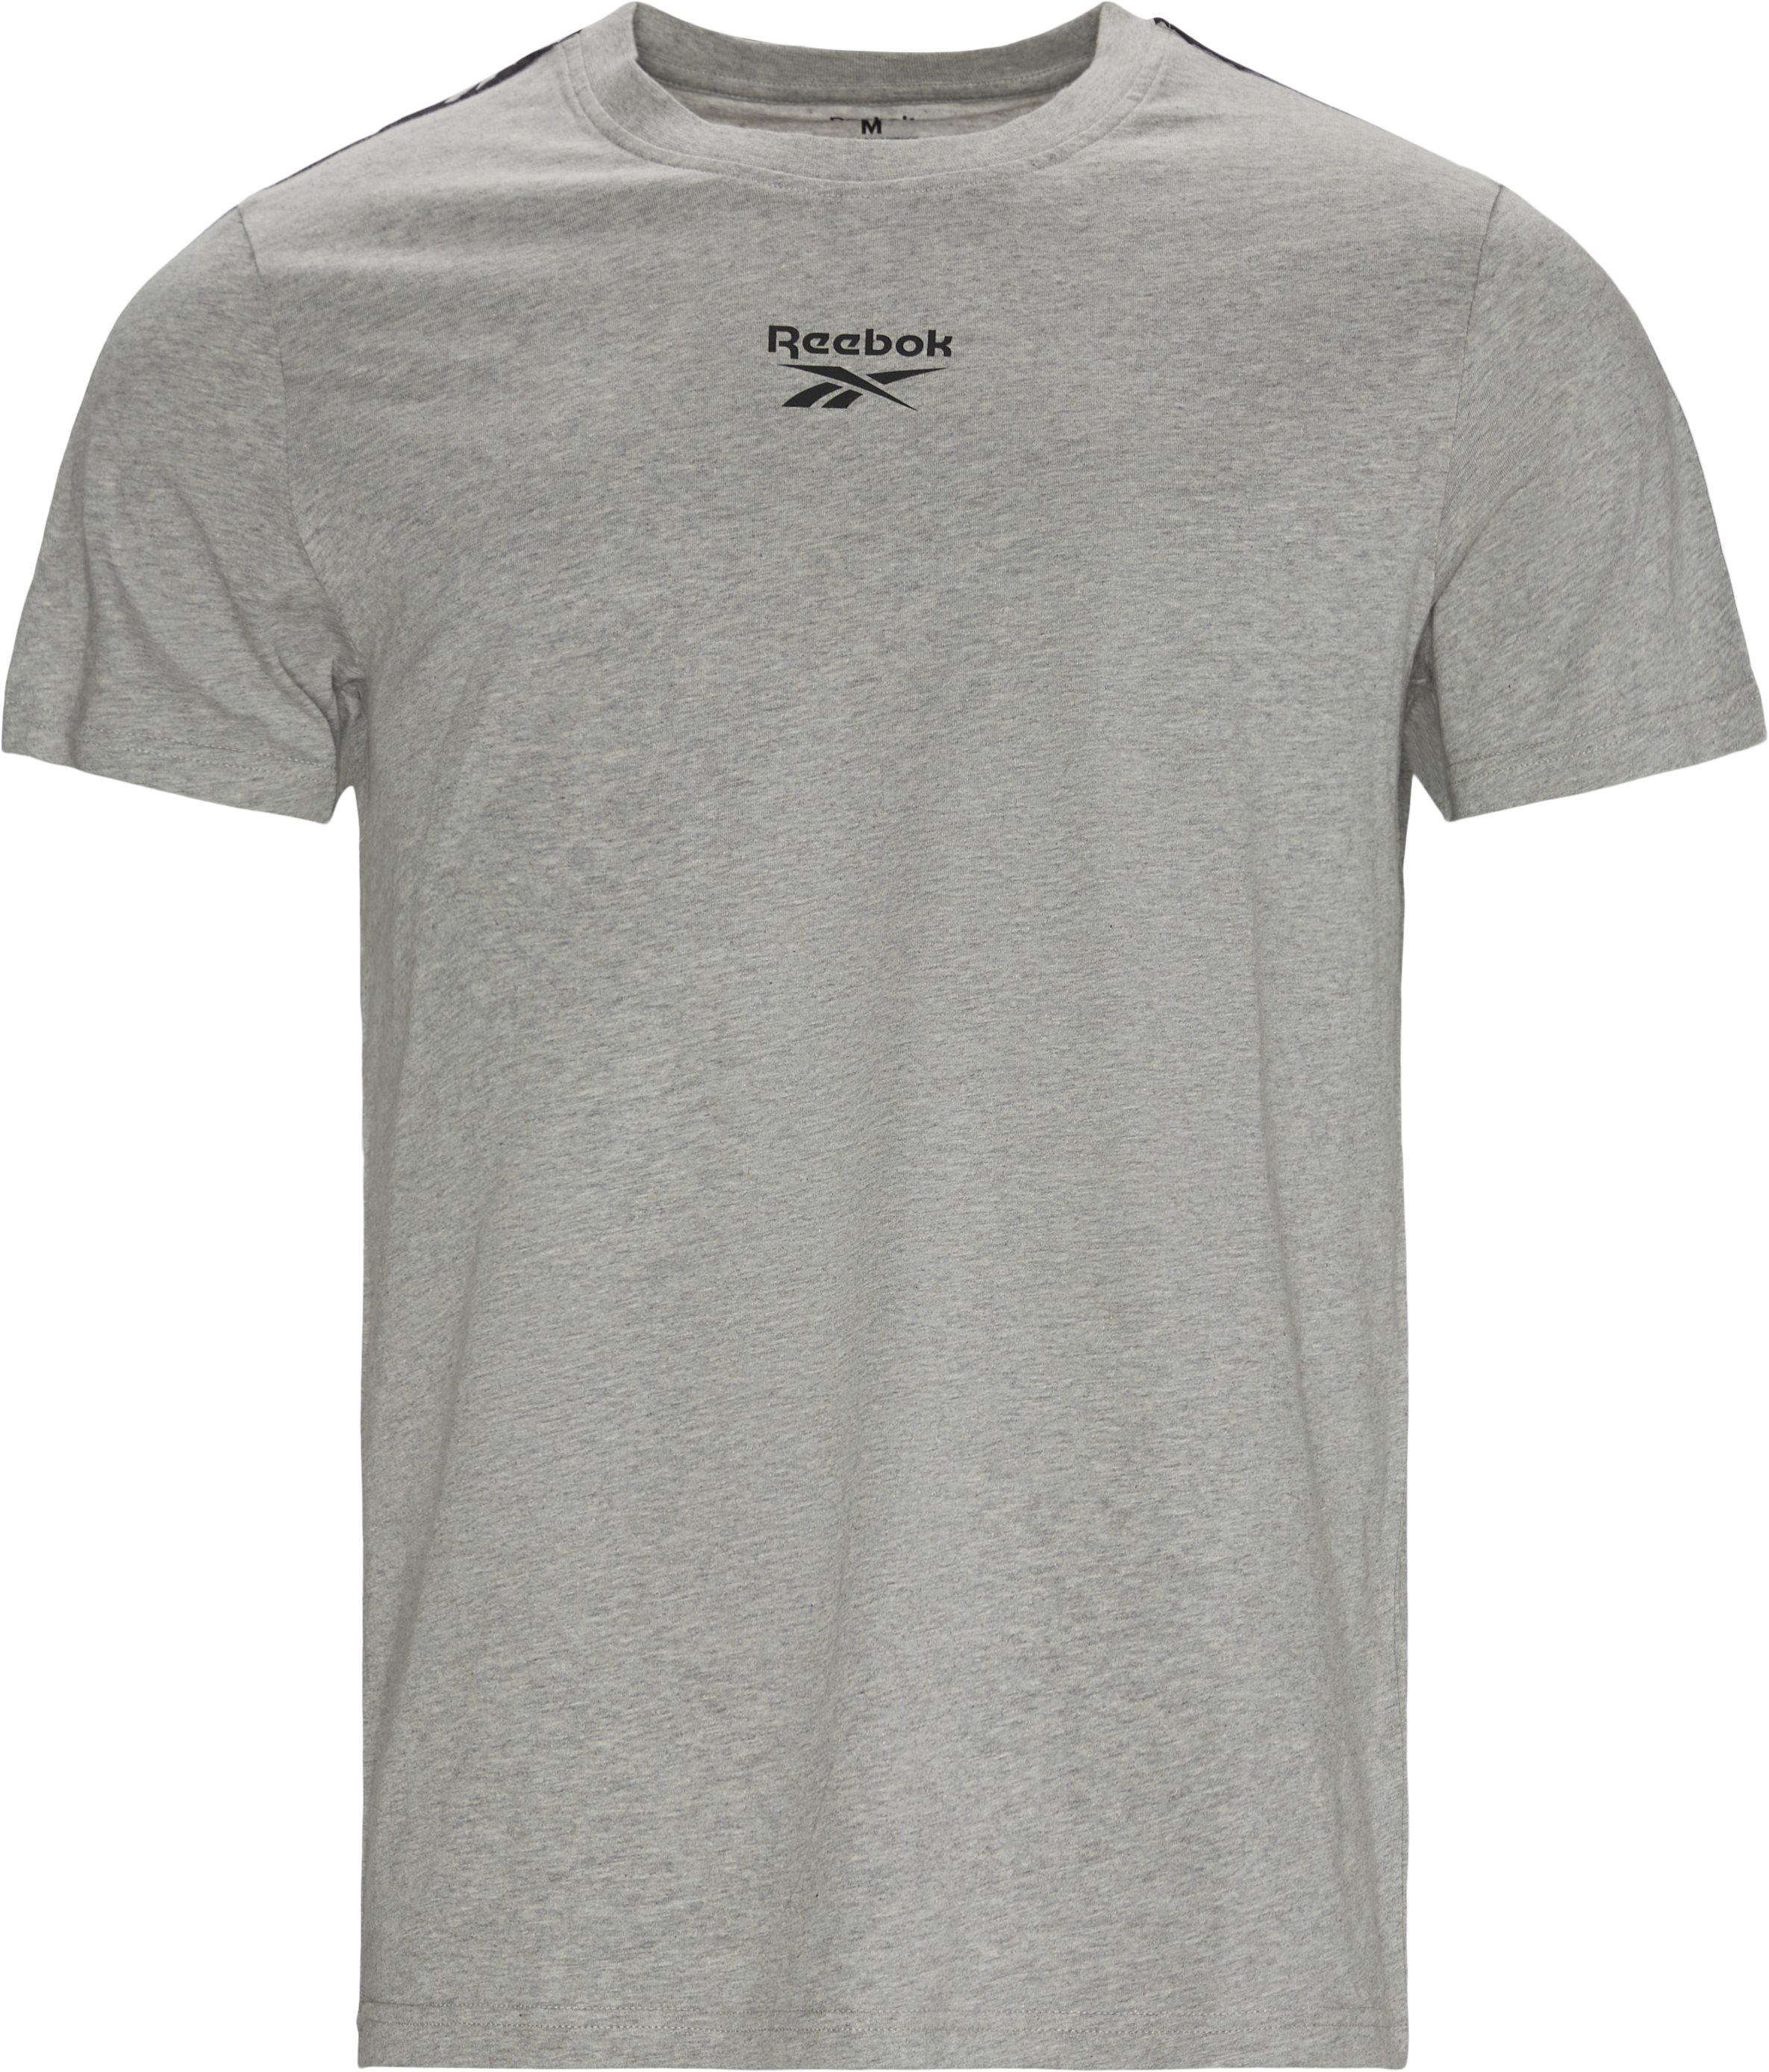 Te Tape Tee - T-shirts - Regular - Grey